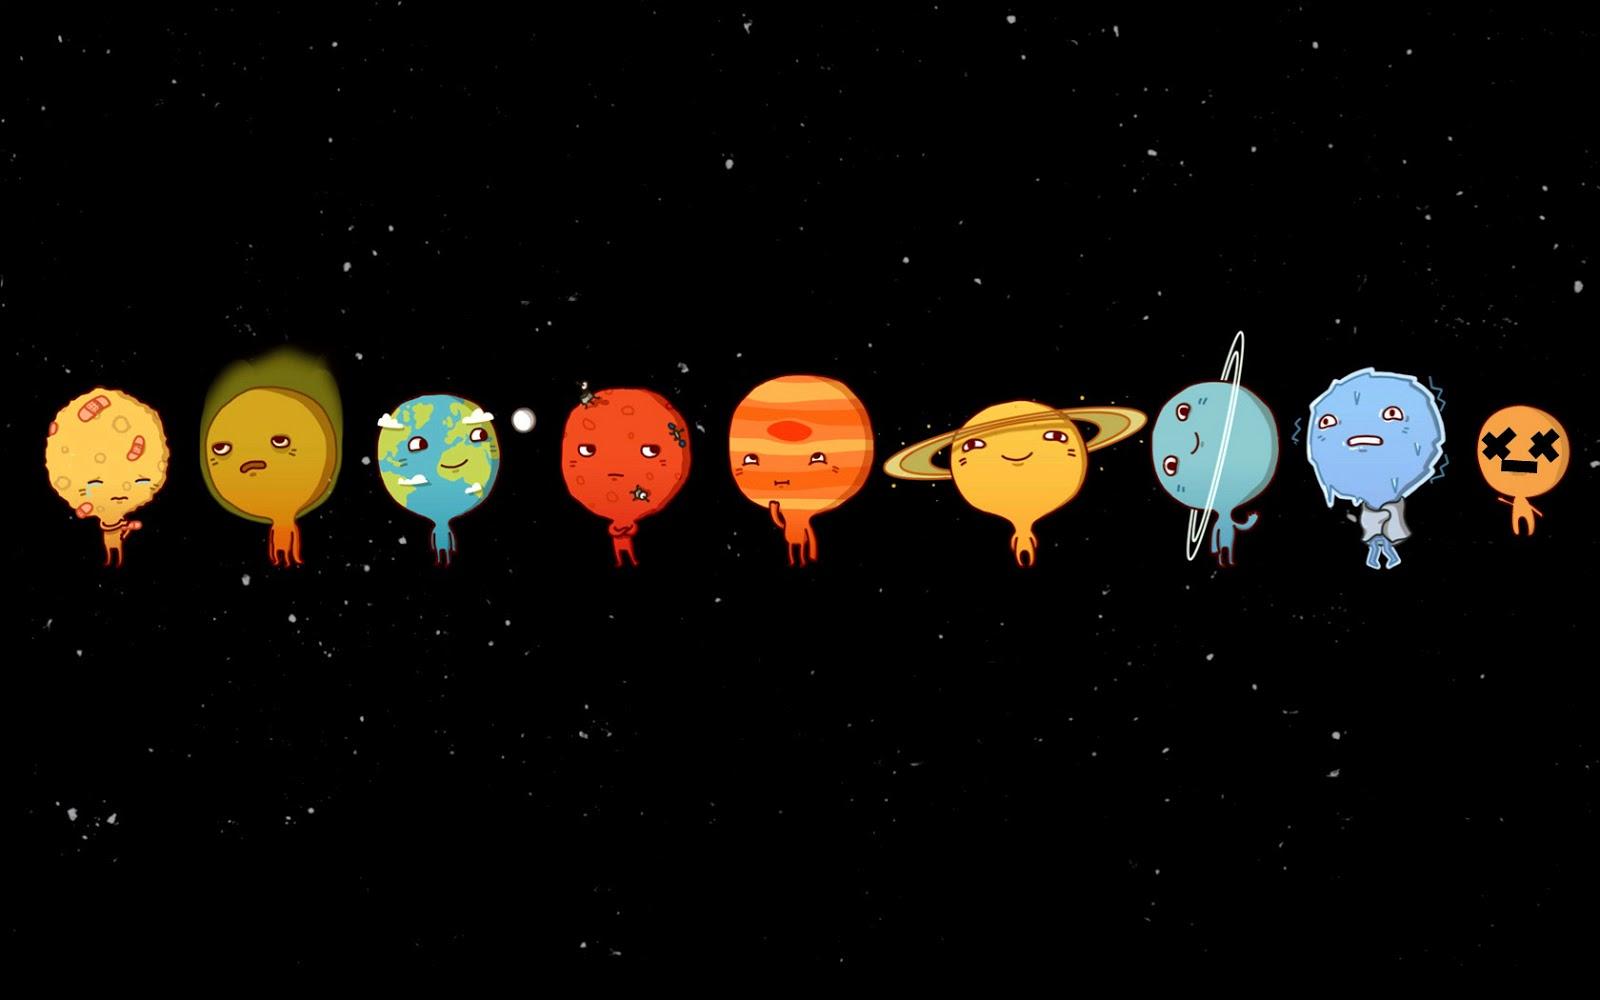 solar system hd background - photo #22